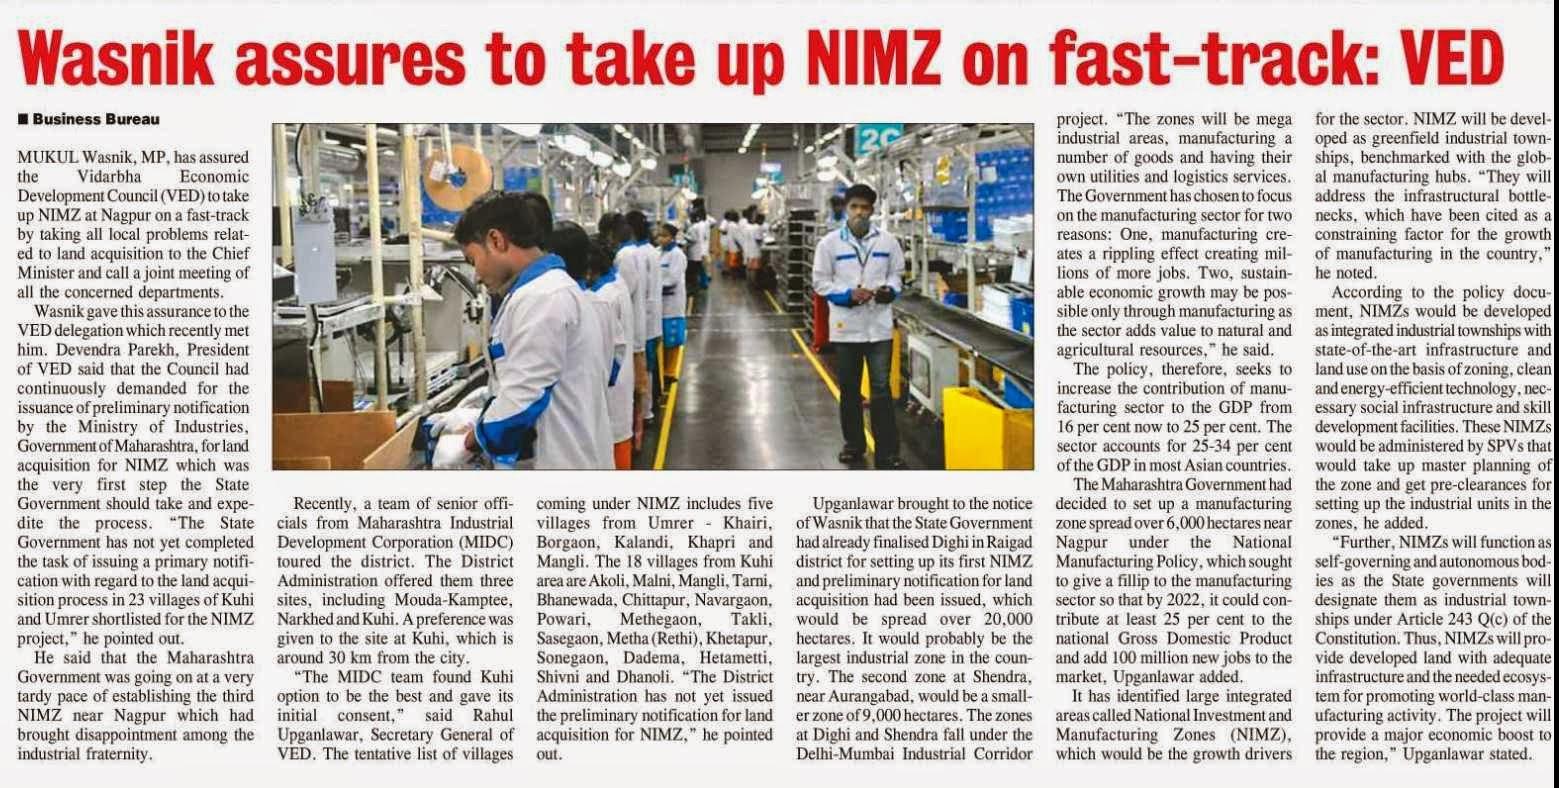 Team Samrat Singh --- National Investment & Manufacturing Zone (NIMZ